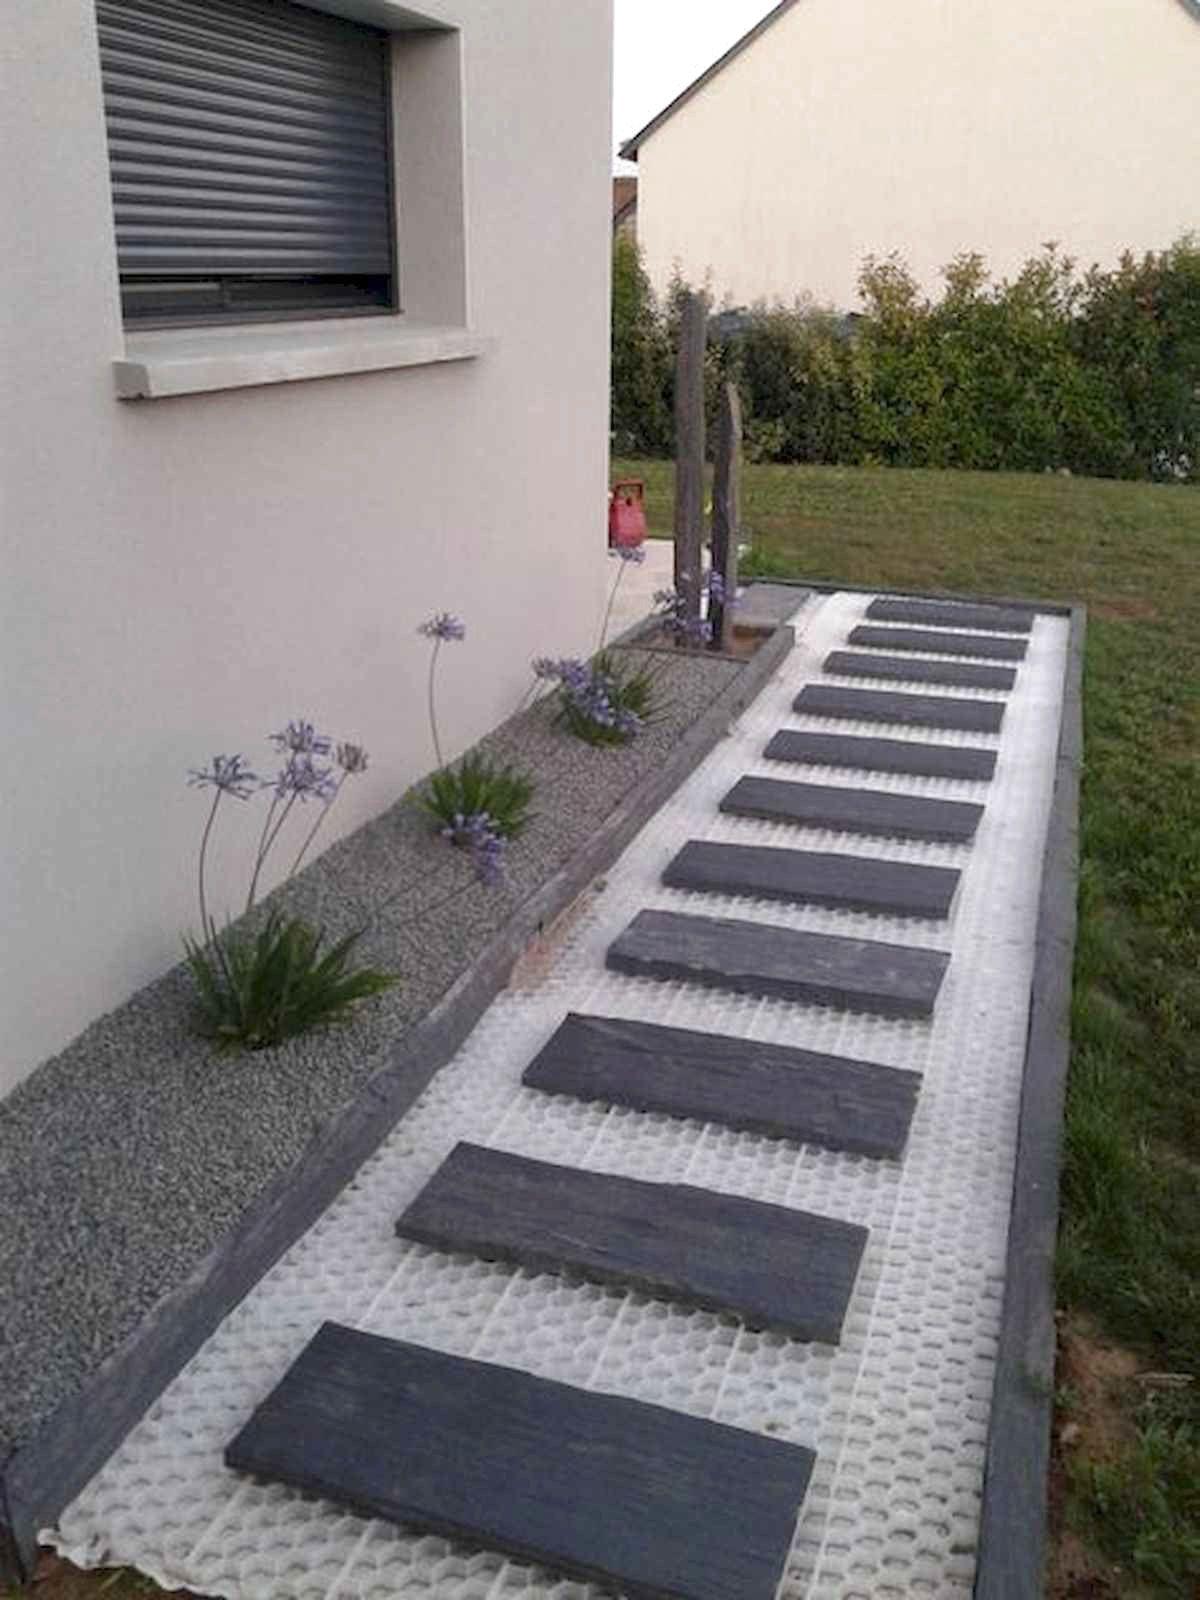 56 Favourite Garden Path And Walkway Ideas Design Ideas ...